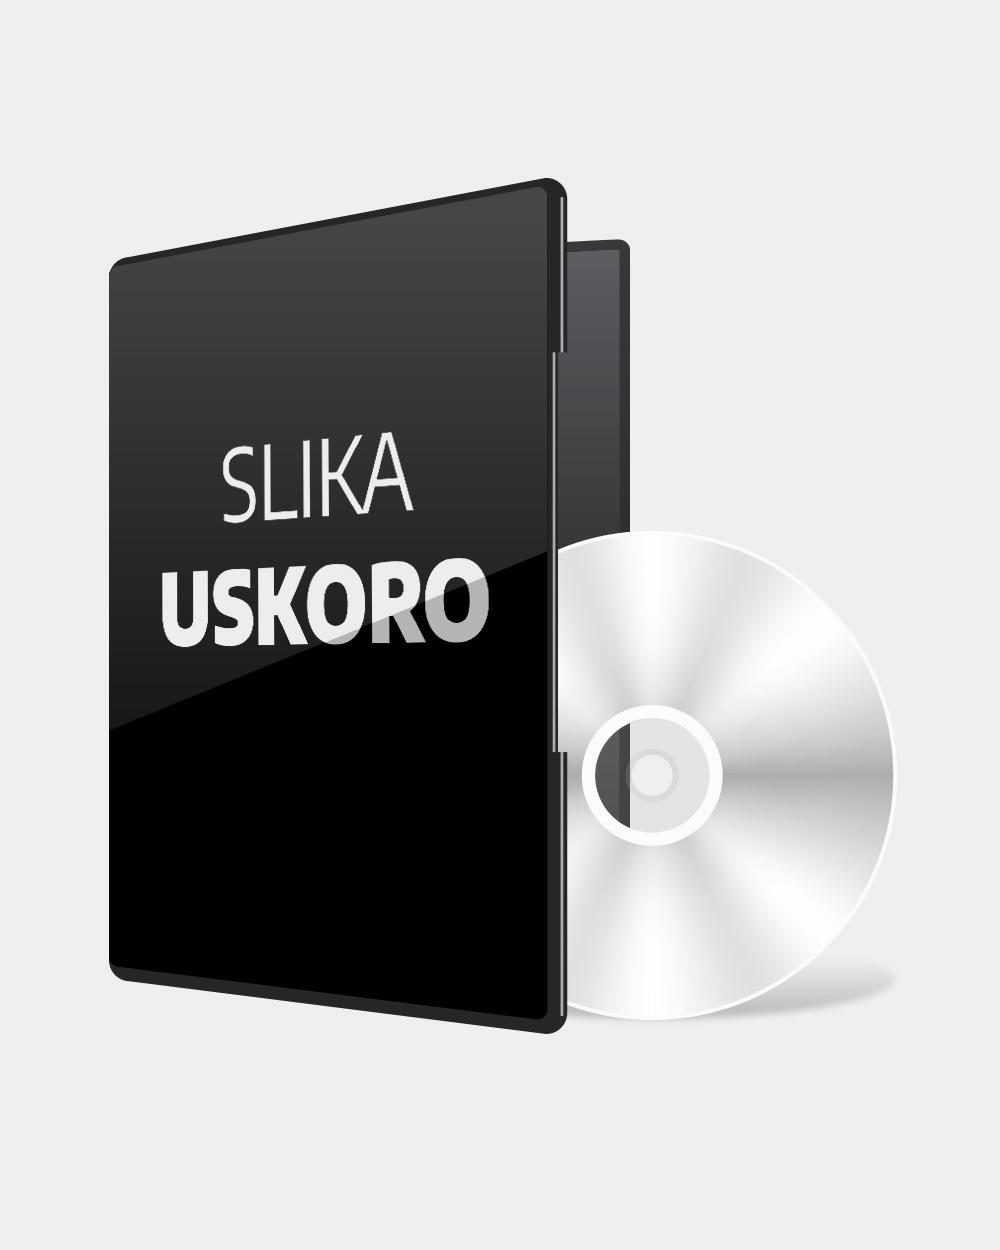 PS4 Far Cry New Dawn - Superbloom Edition